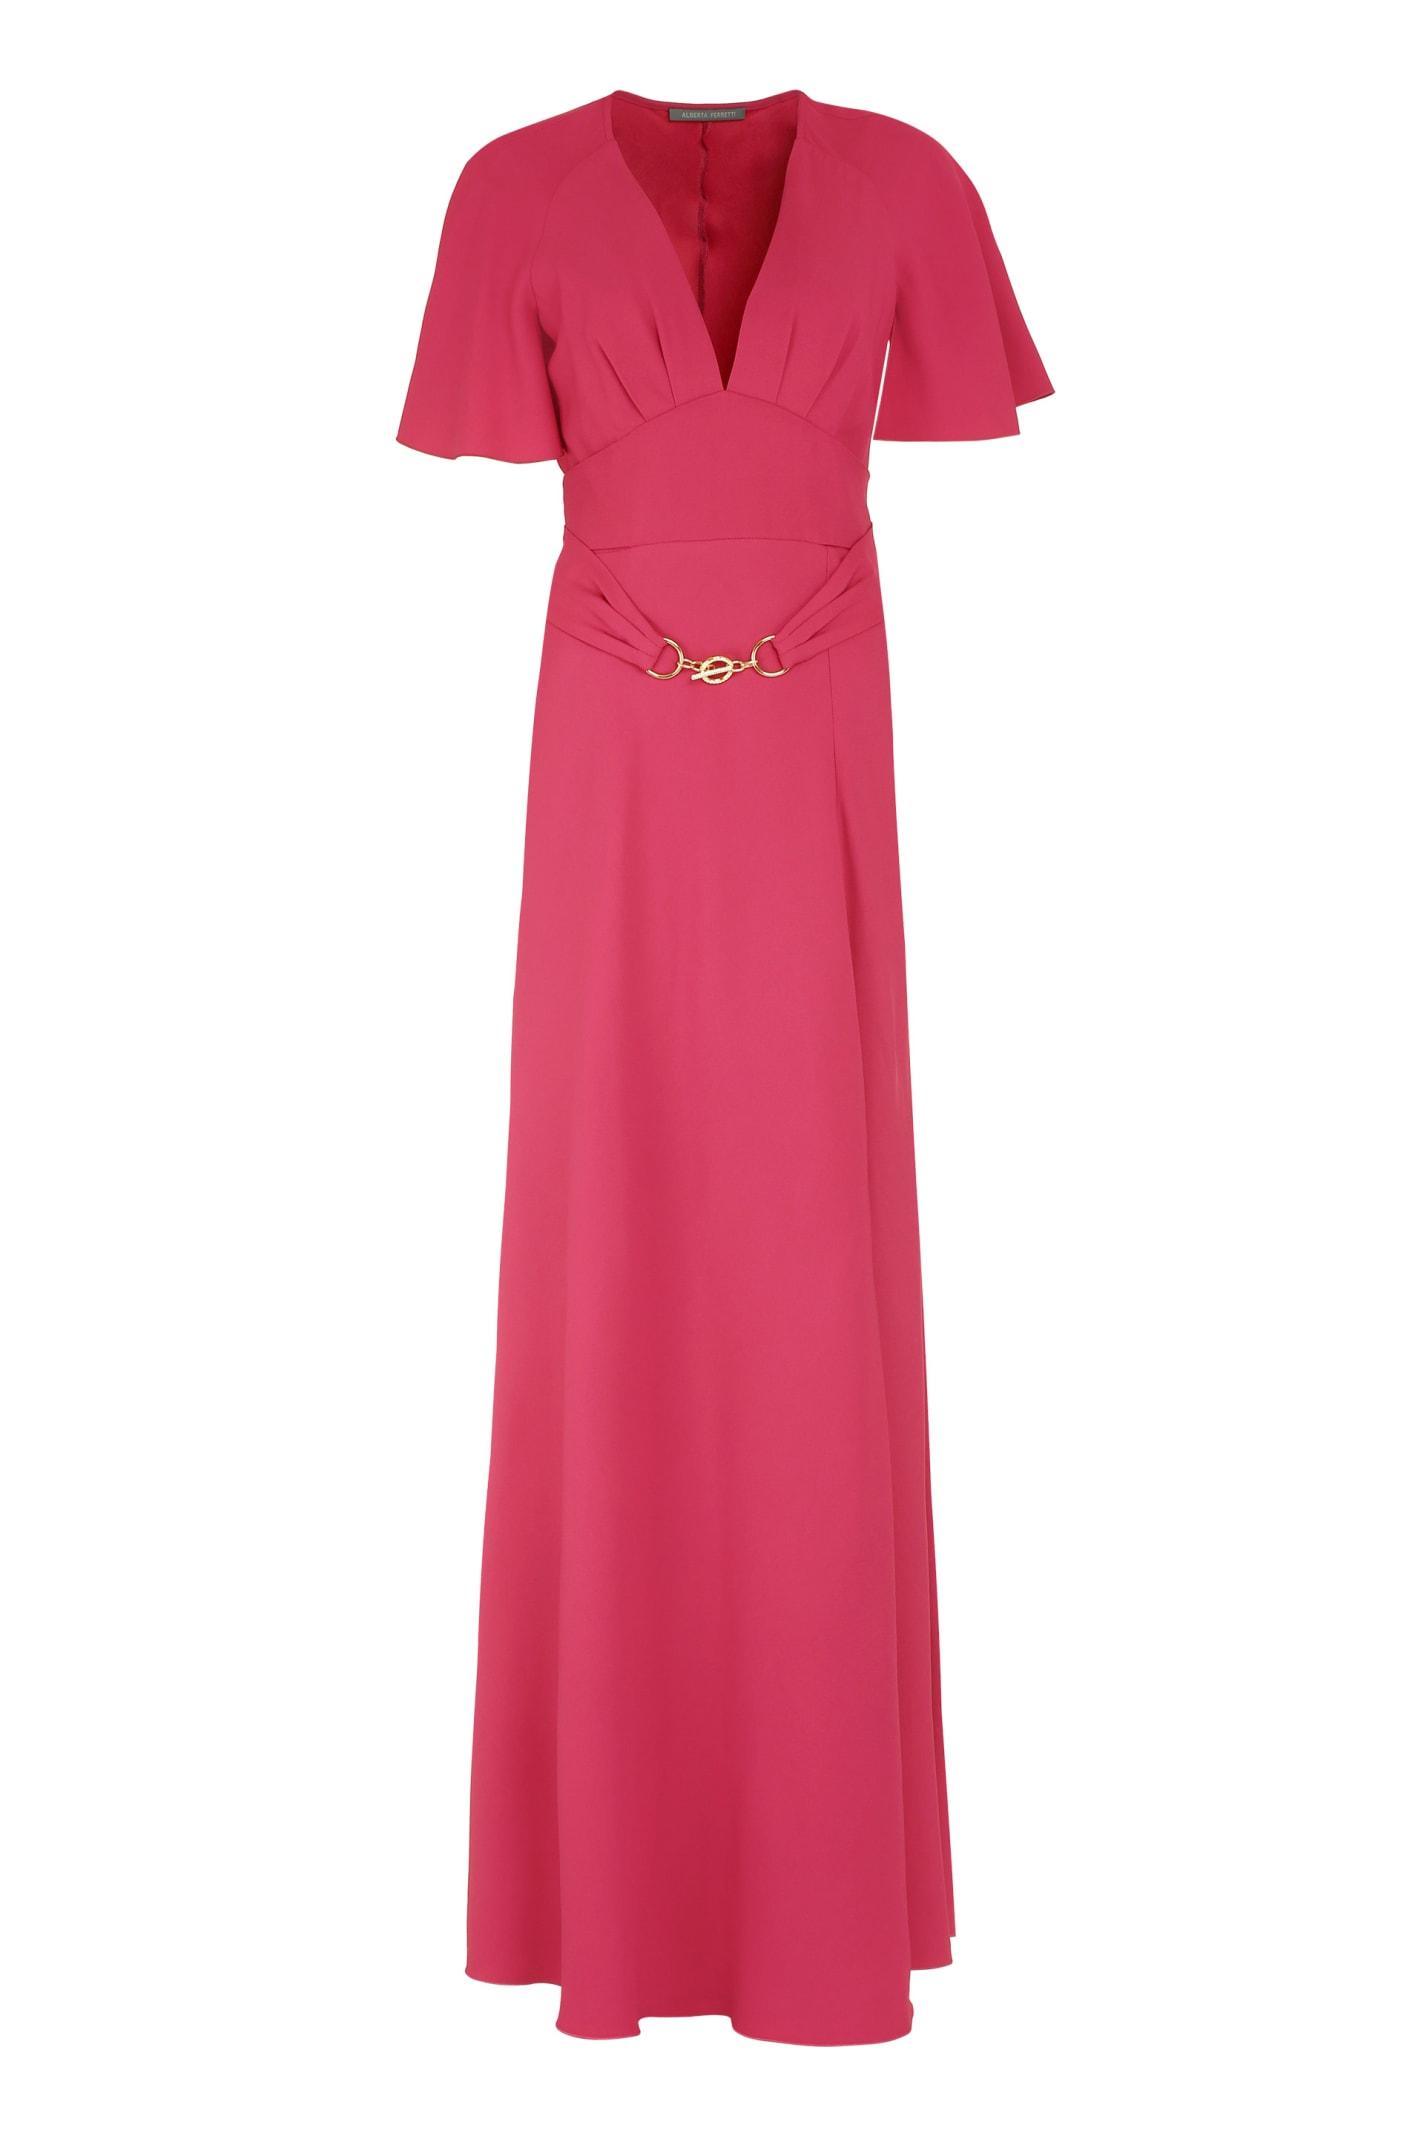 Buy Alberta Ferretti Crêpe Envers Satin Dress online, shop Alberta Ferretti with free shipping